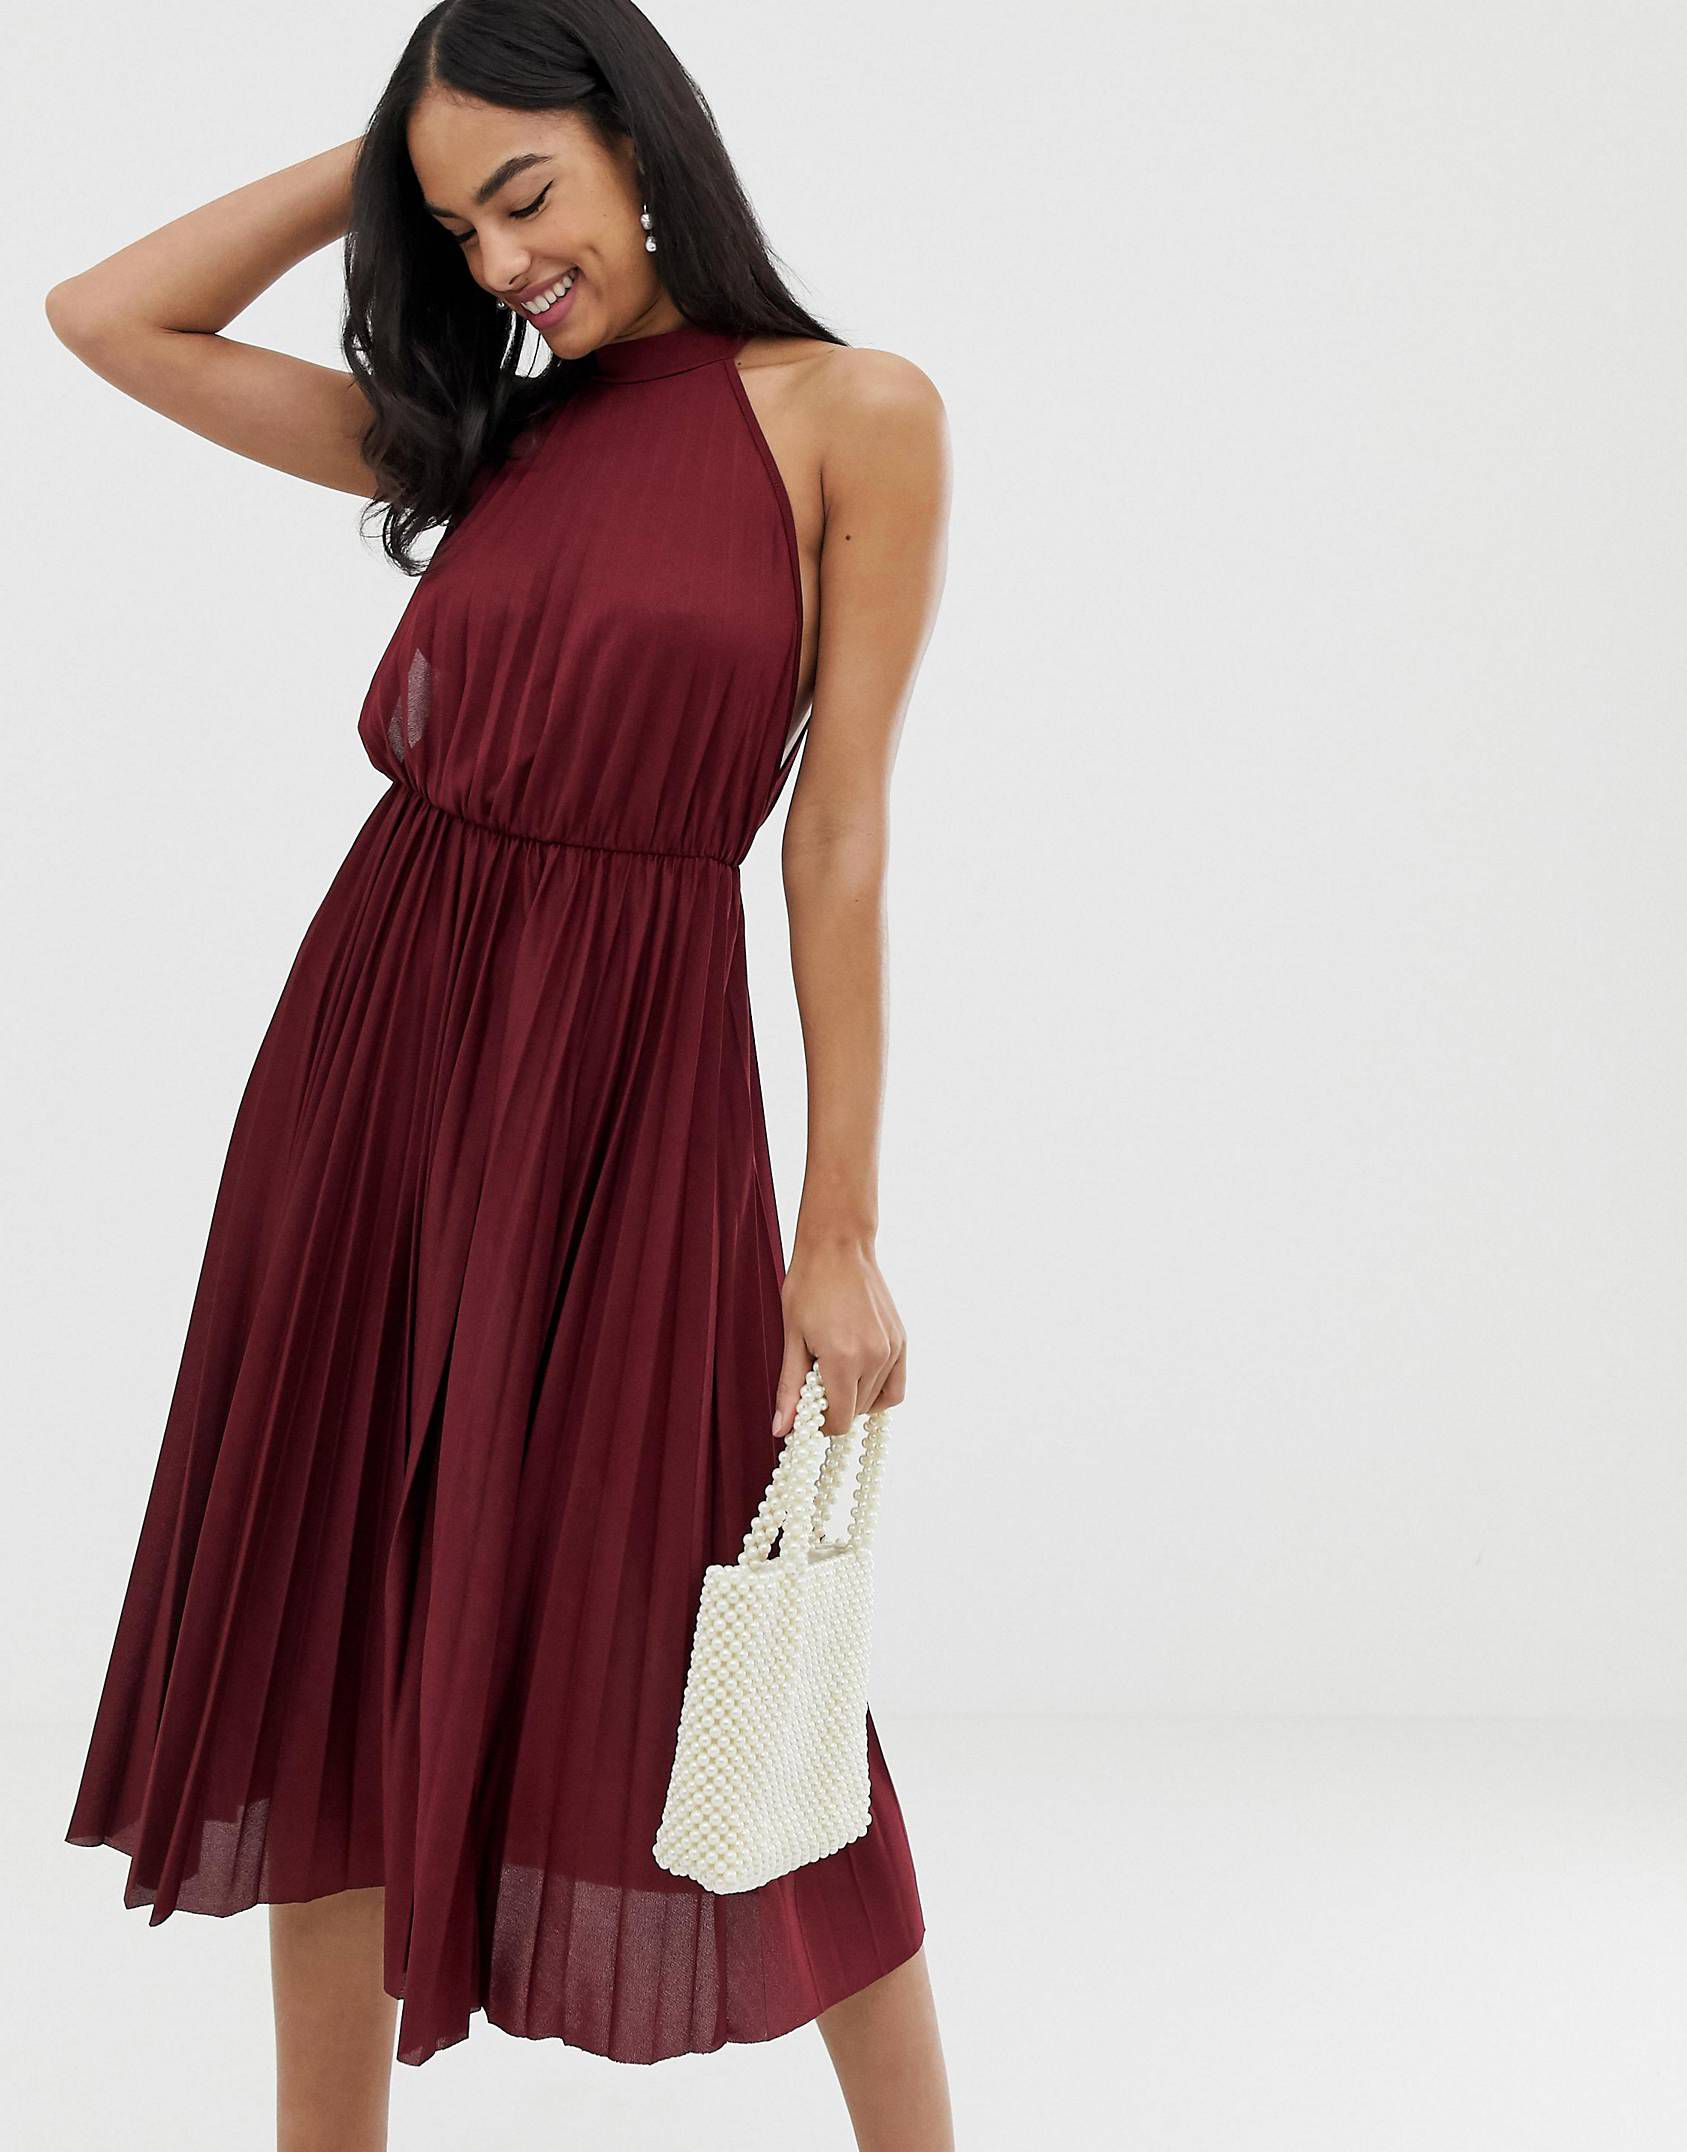 49+ Asos cami pleated midi dress ideas in 2021